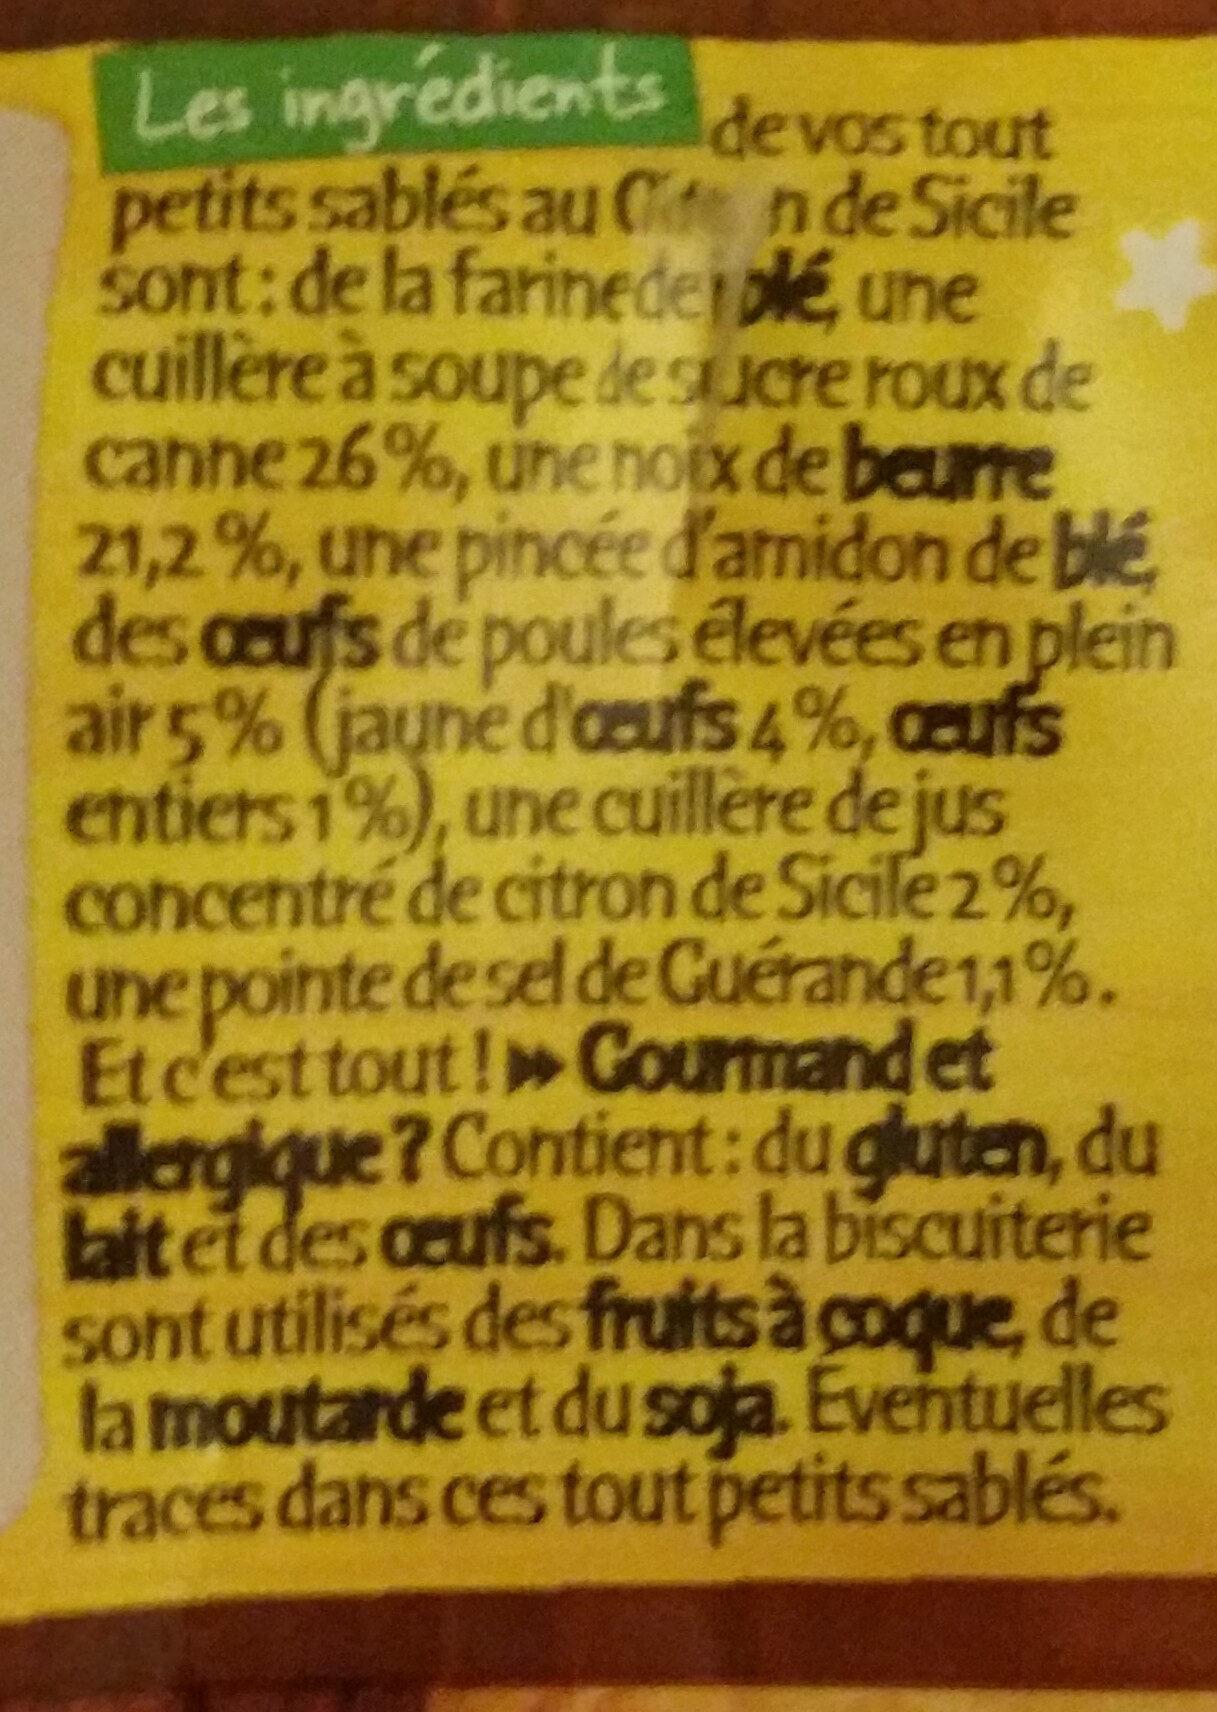 Tout petits sablés - Ingrediënten